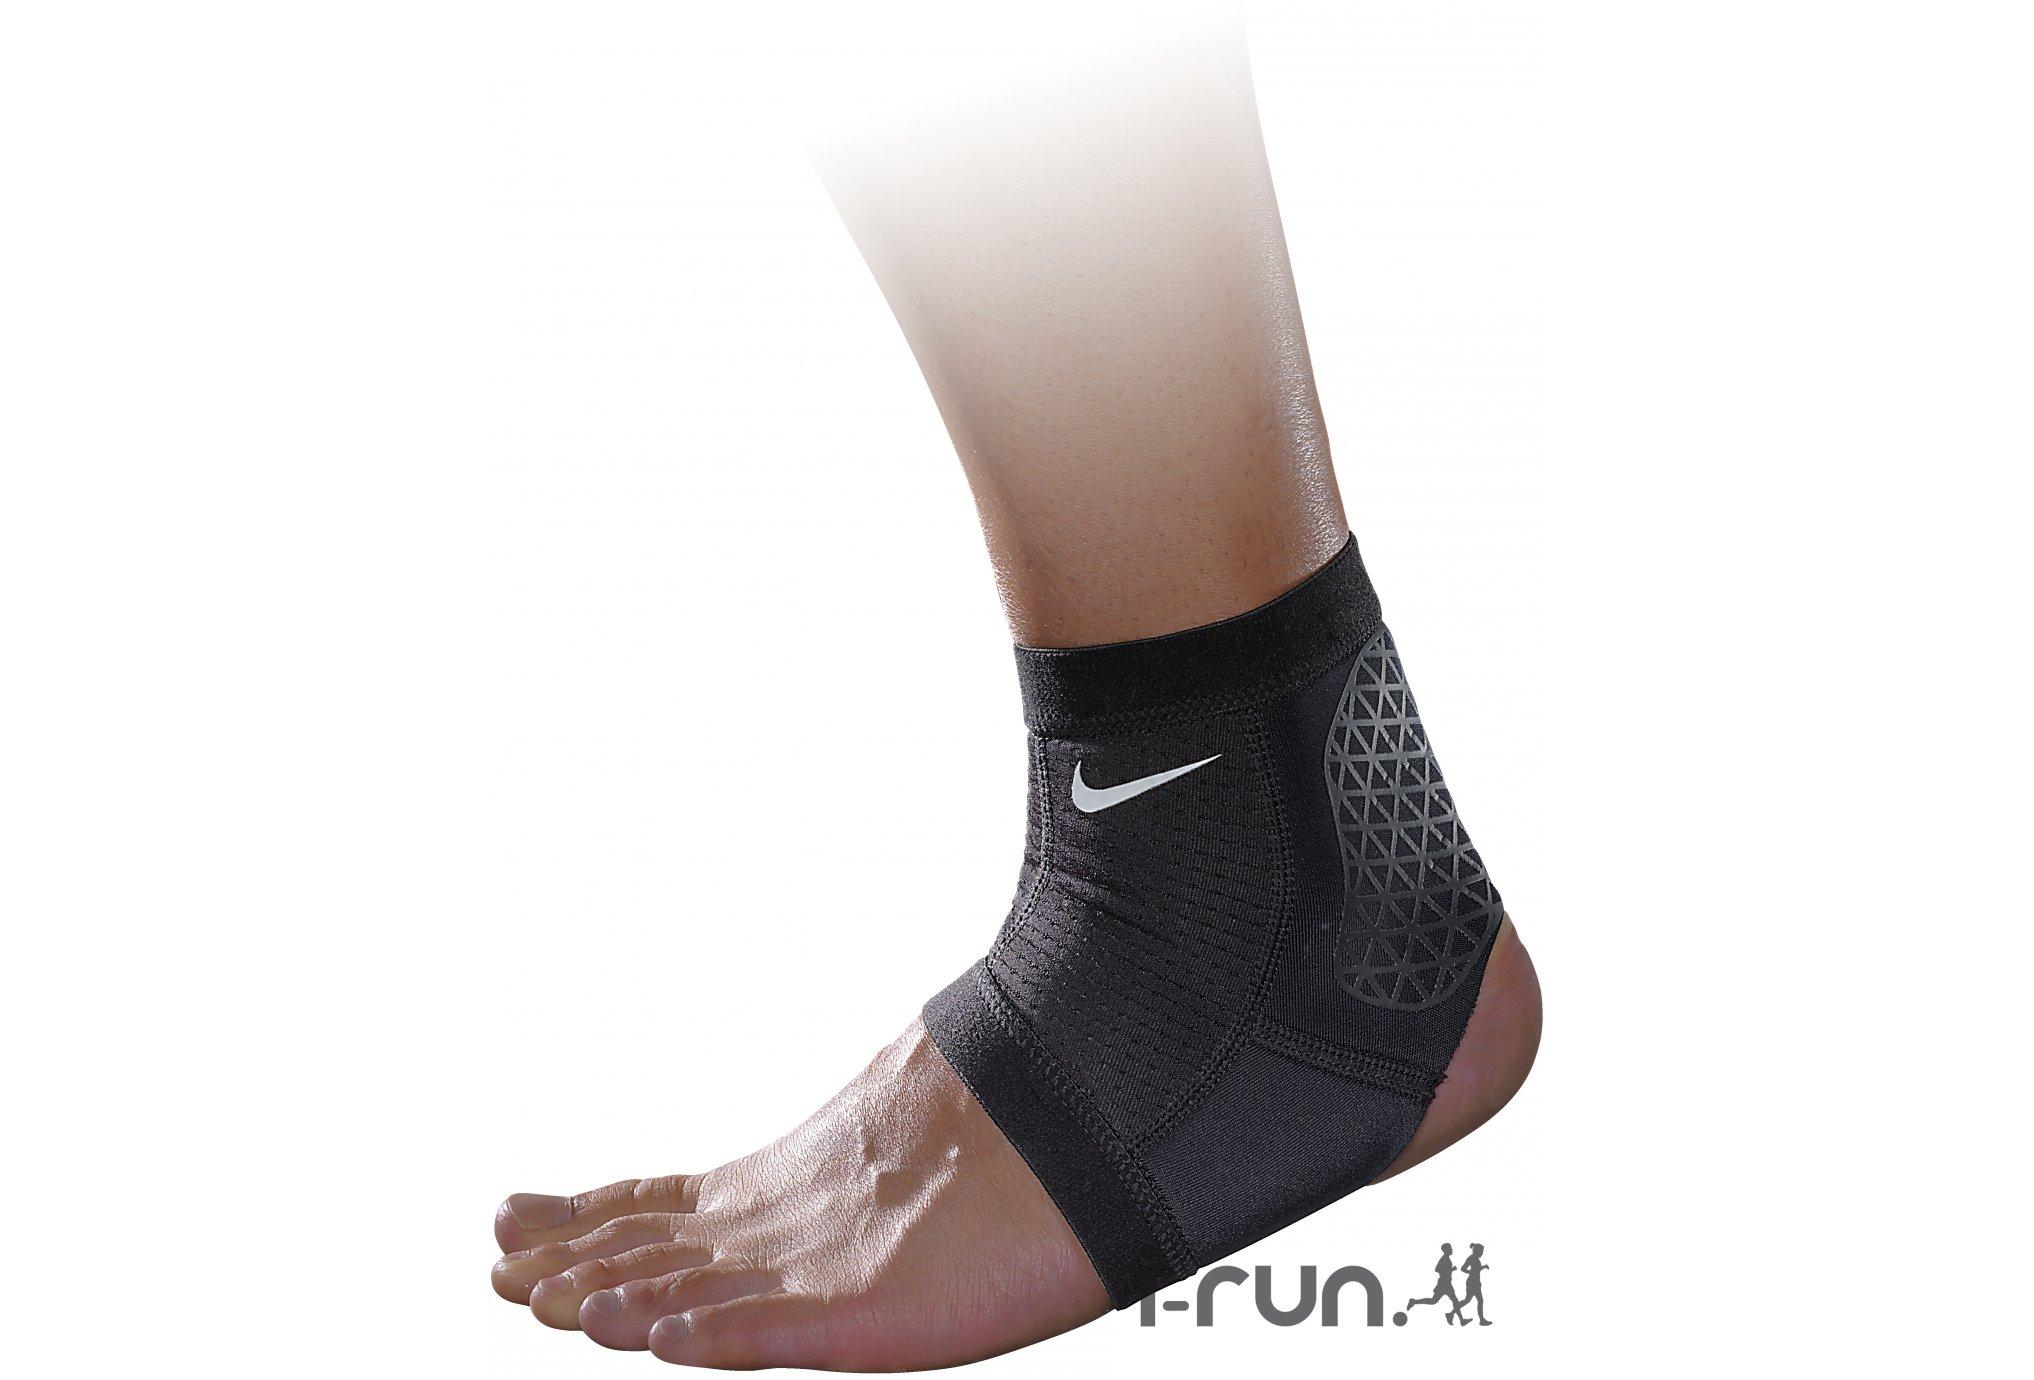 Nike Chevillère de Combat Nike Pro Protection musculaire & articulaire